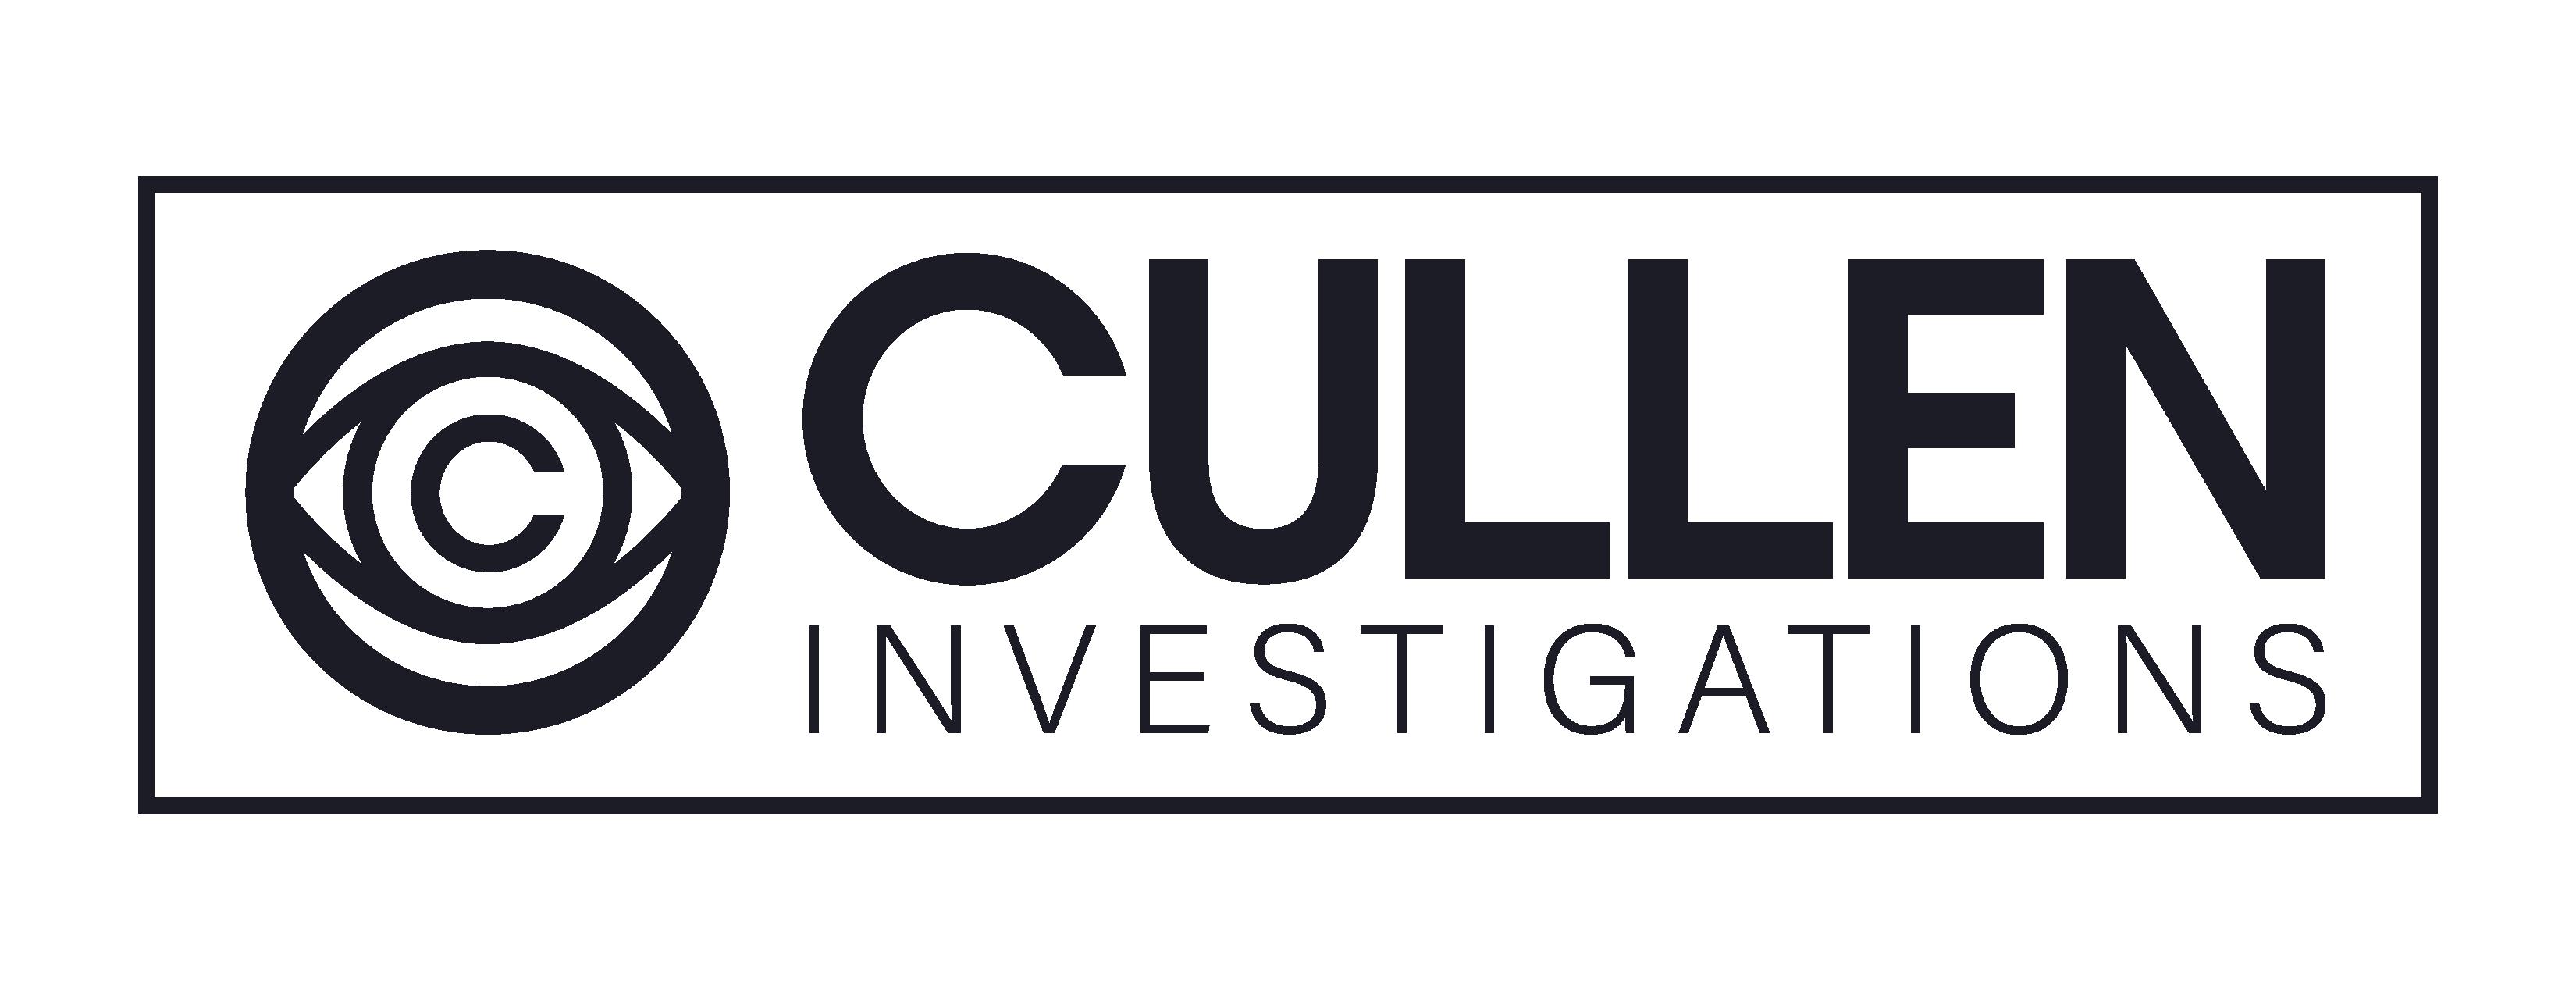 Cullen Investigations primary logo